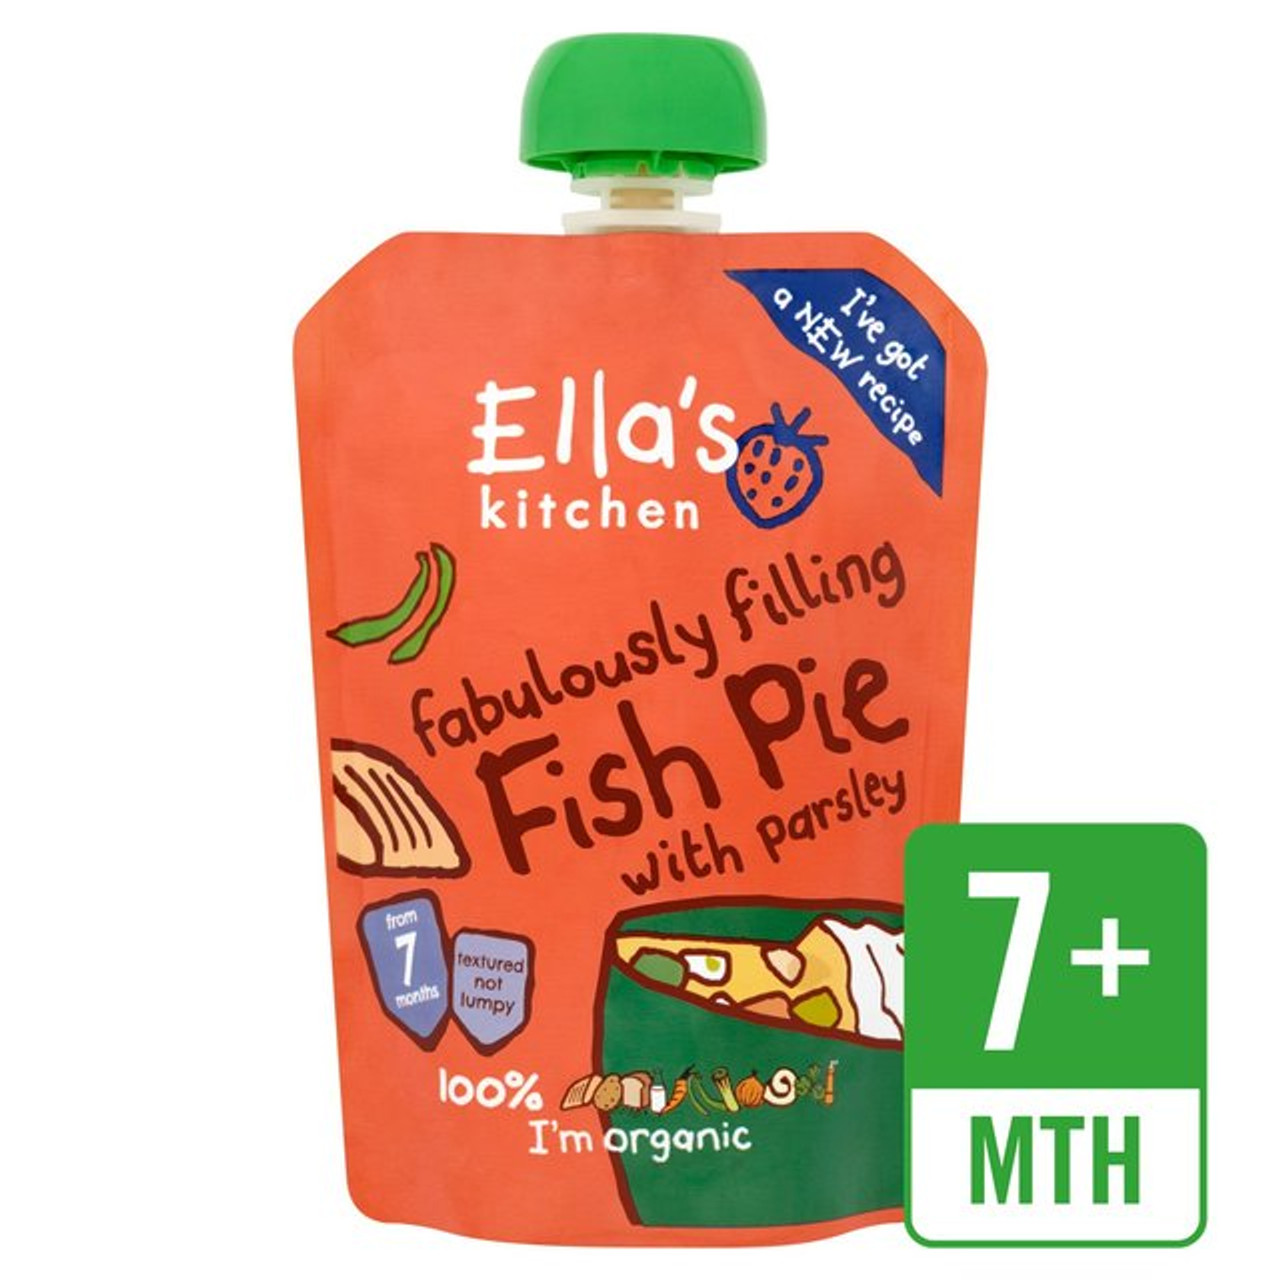 ellas kitchen fabulously filling fish pie 130g - Ellas Kitchen